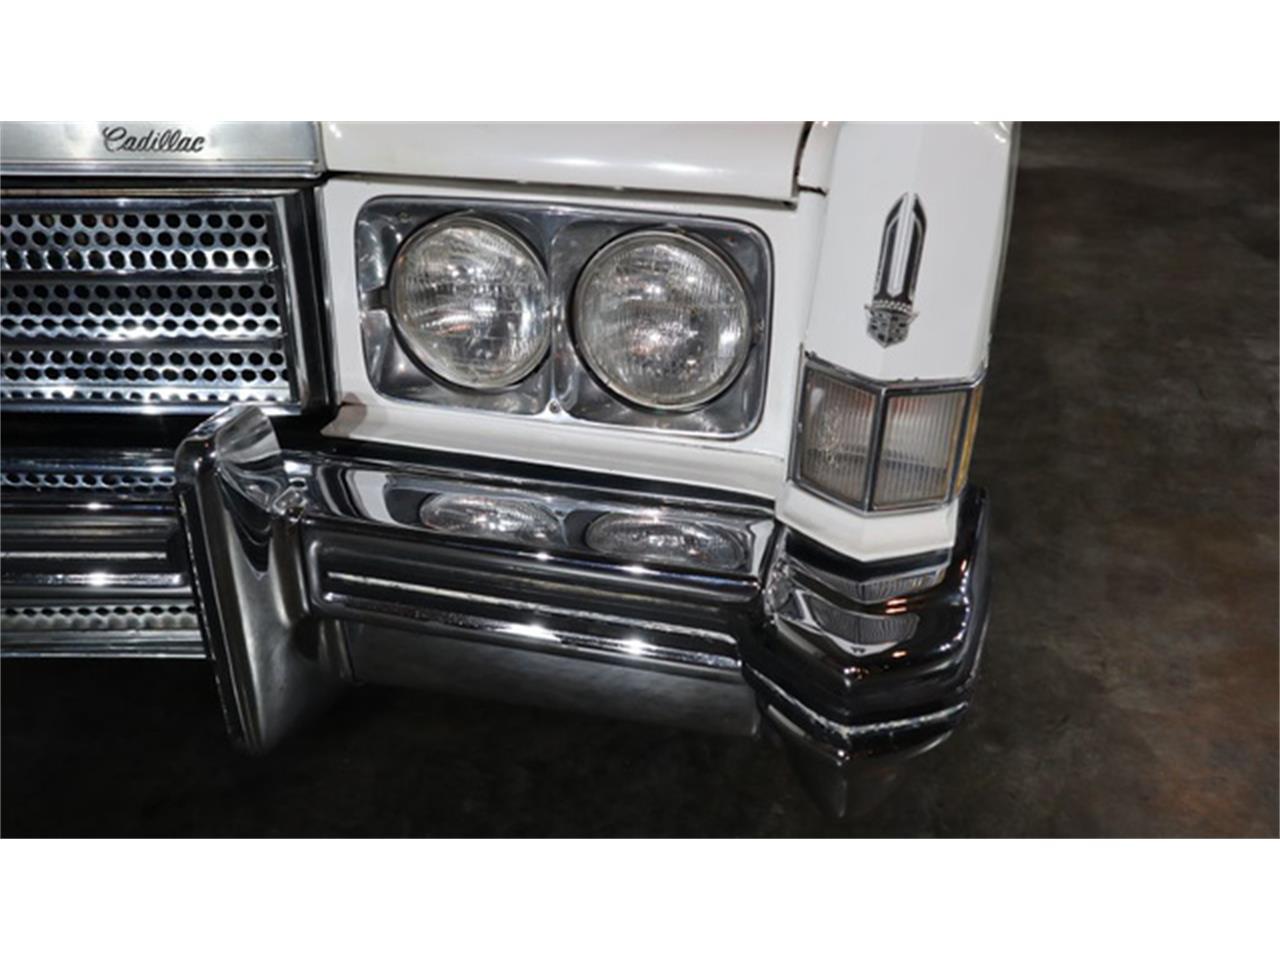 1973 Cadillac Eldorado (CC-1414298) for sale in Jackson, Mississippi